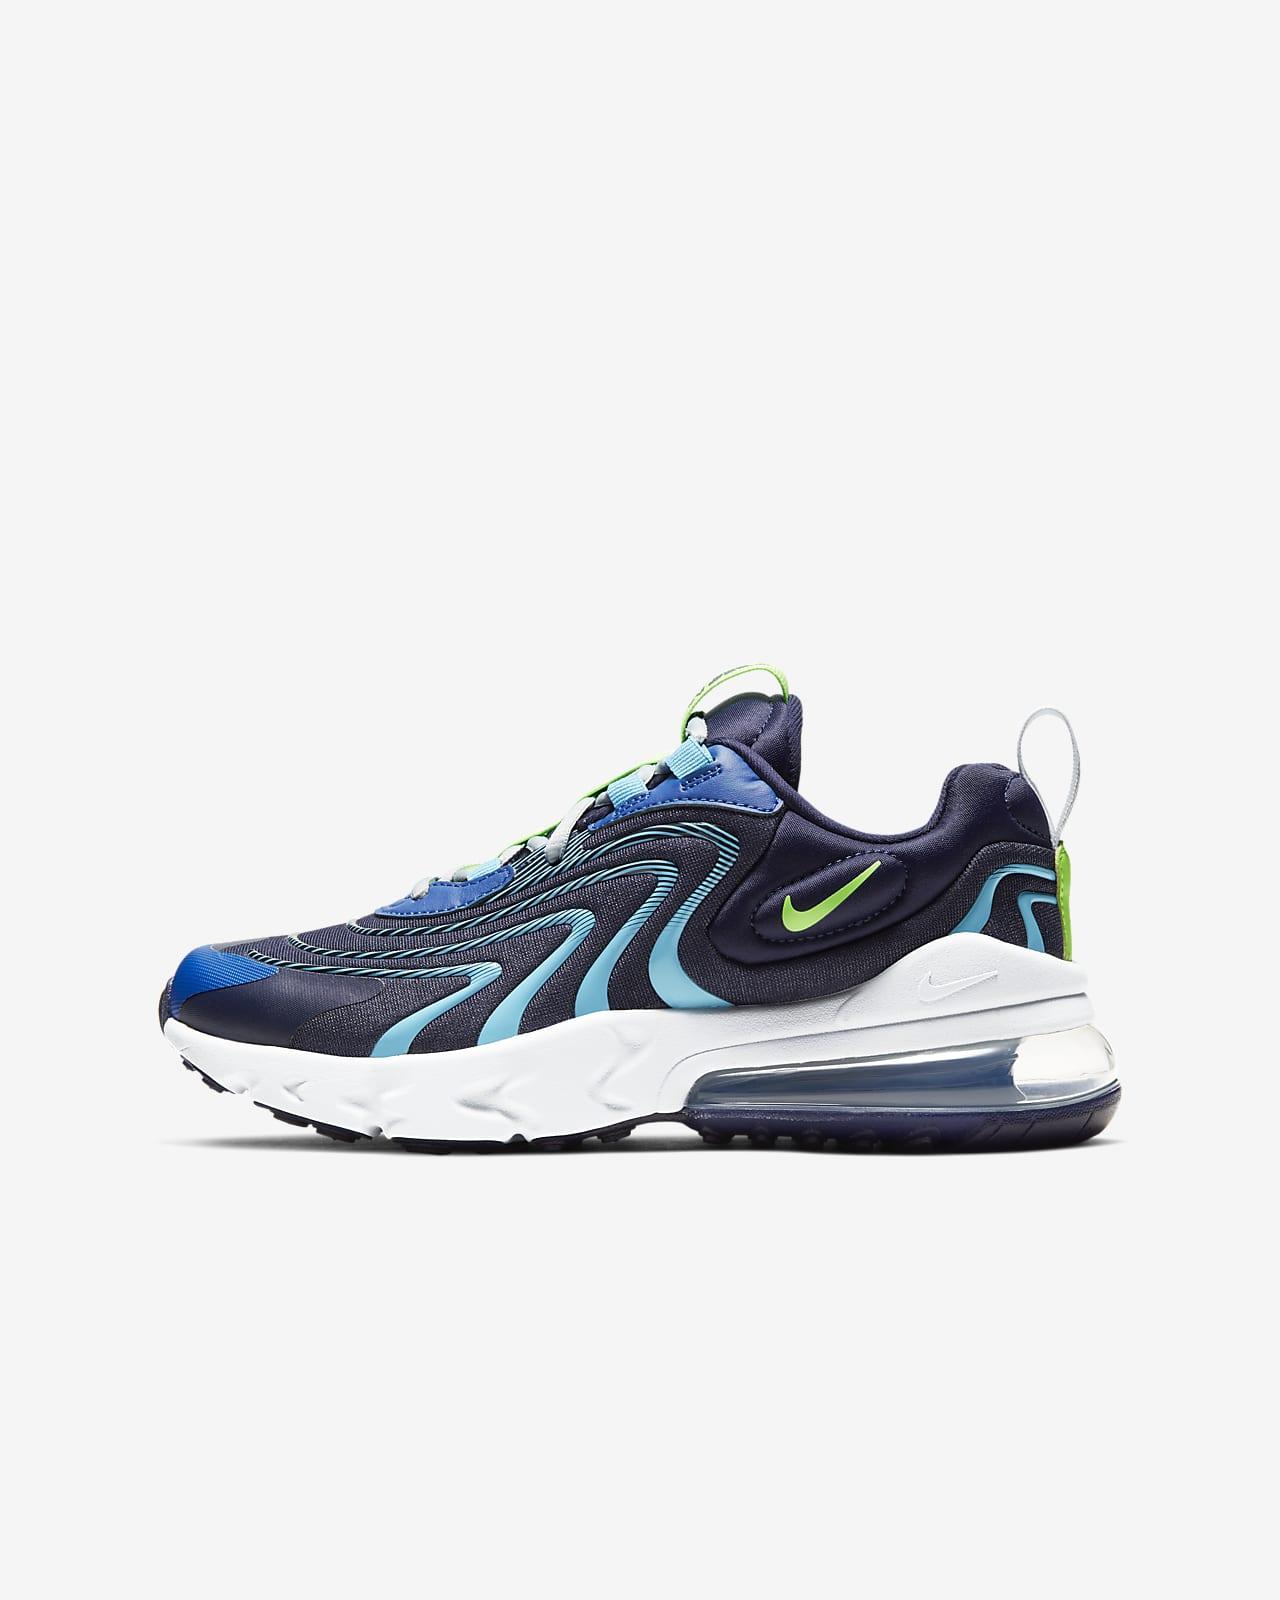 Sko Nike Air Max 270 React ENG för ungdom